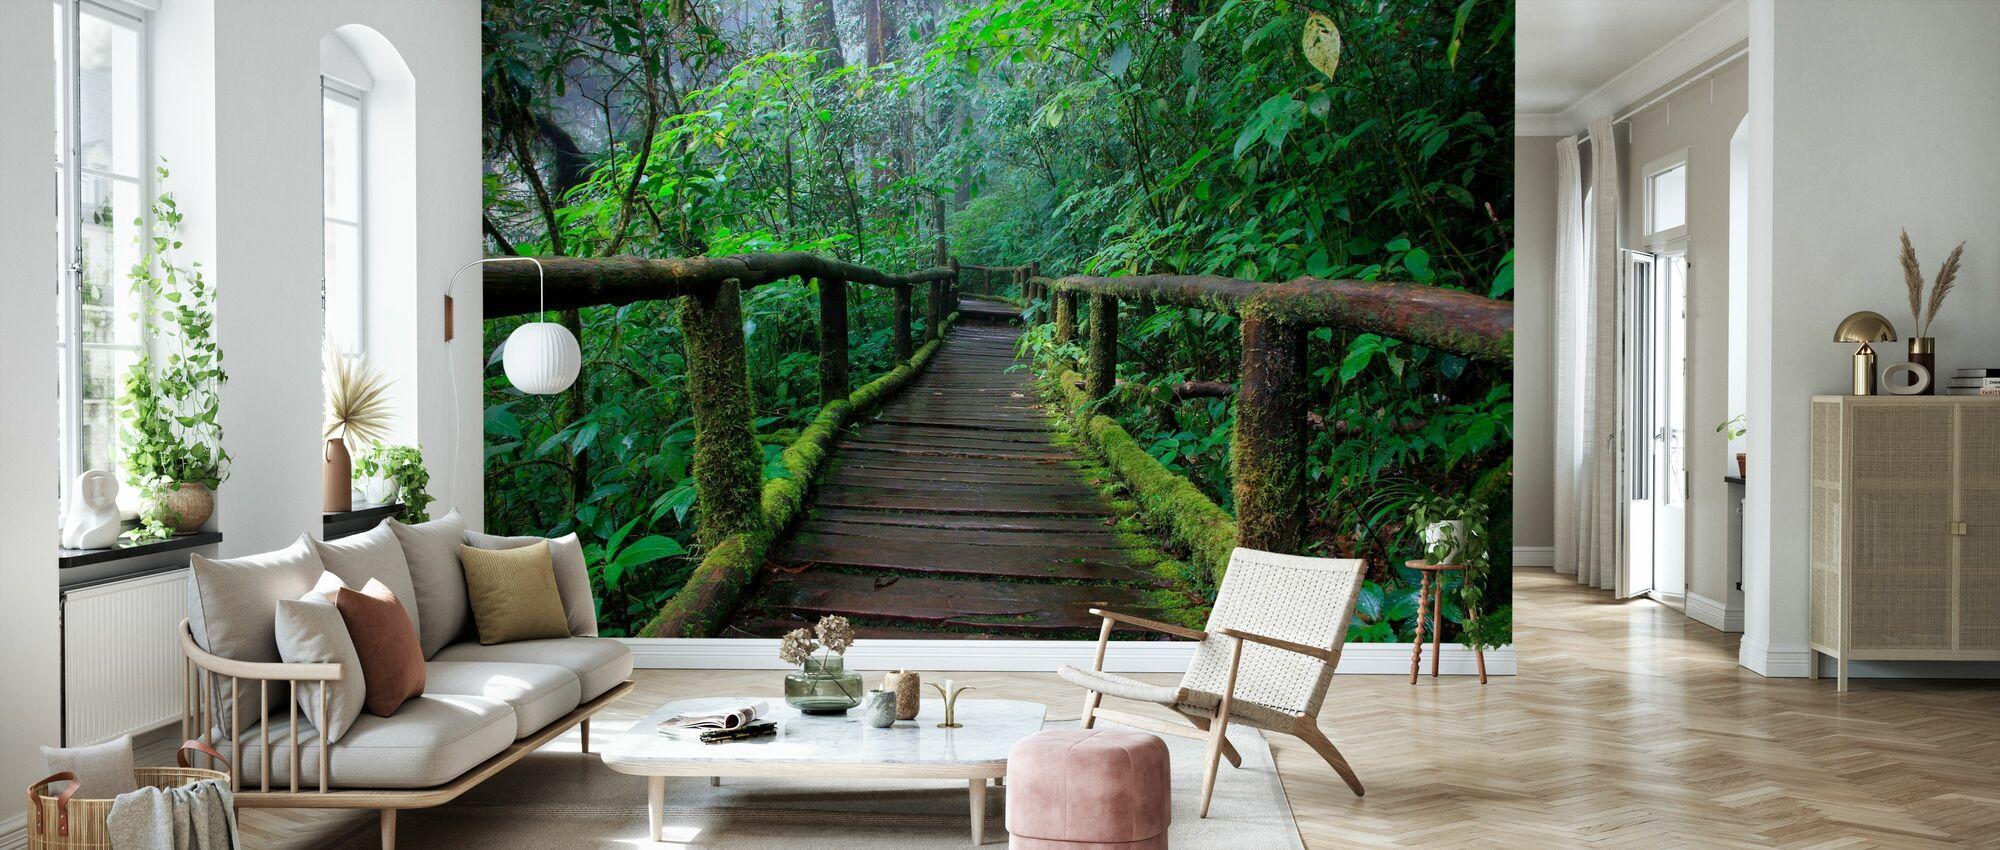 Beautiful Bridge in Thailand - Wallpaper - Living Room